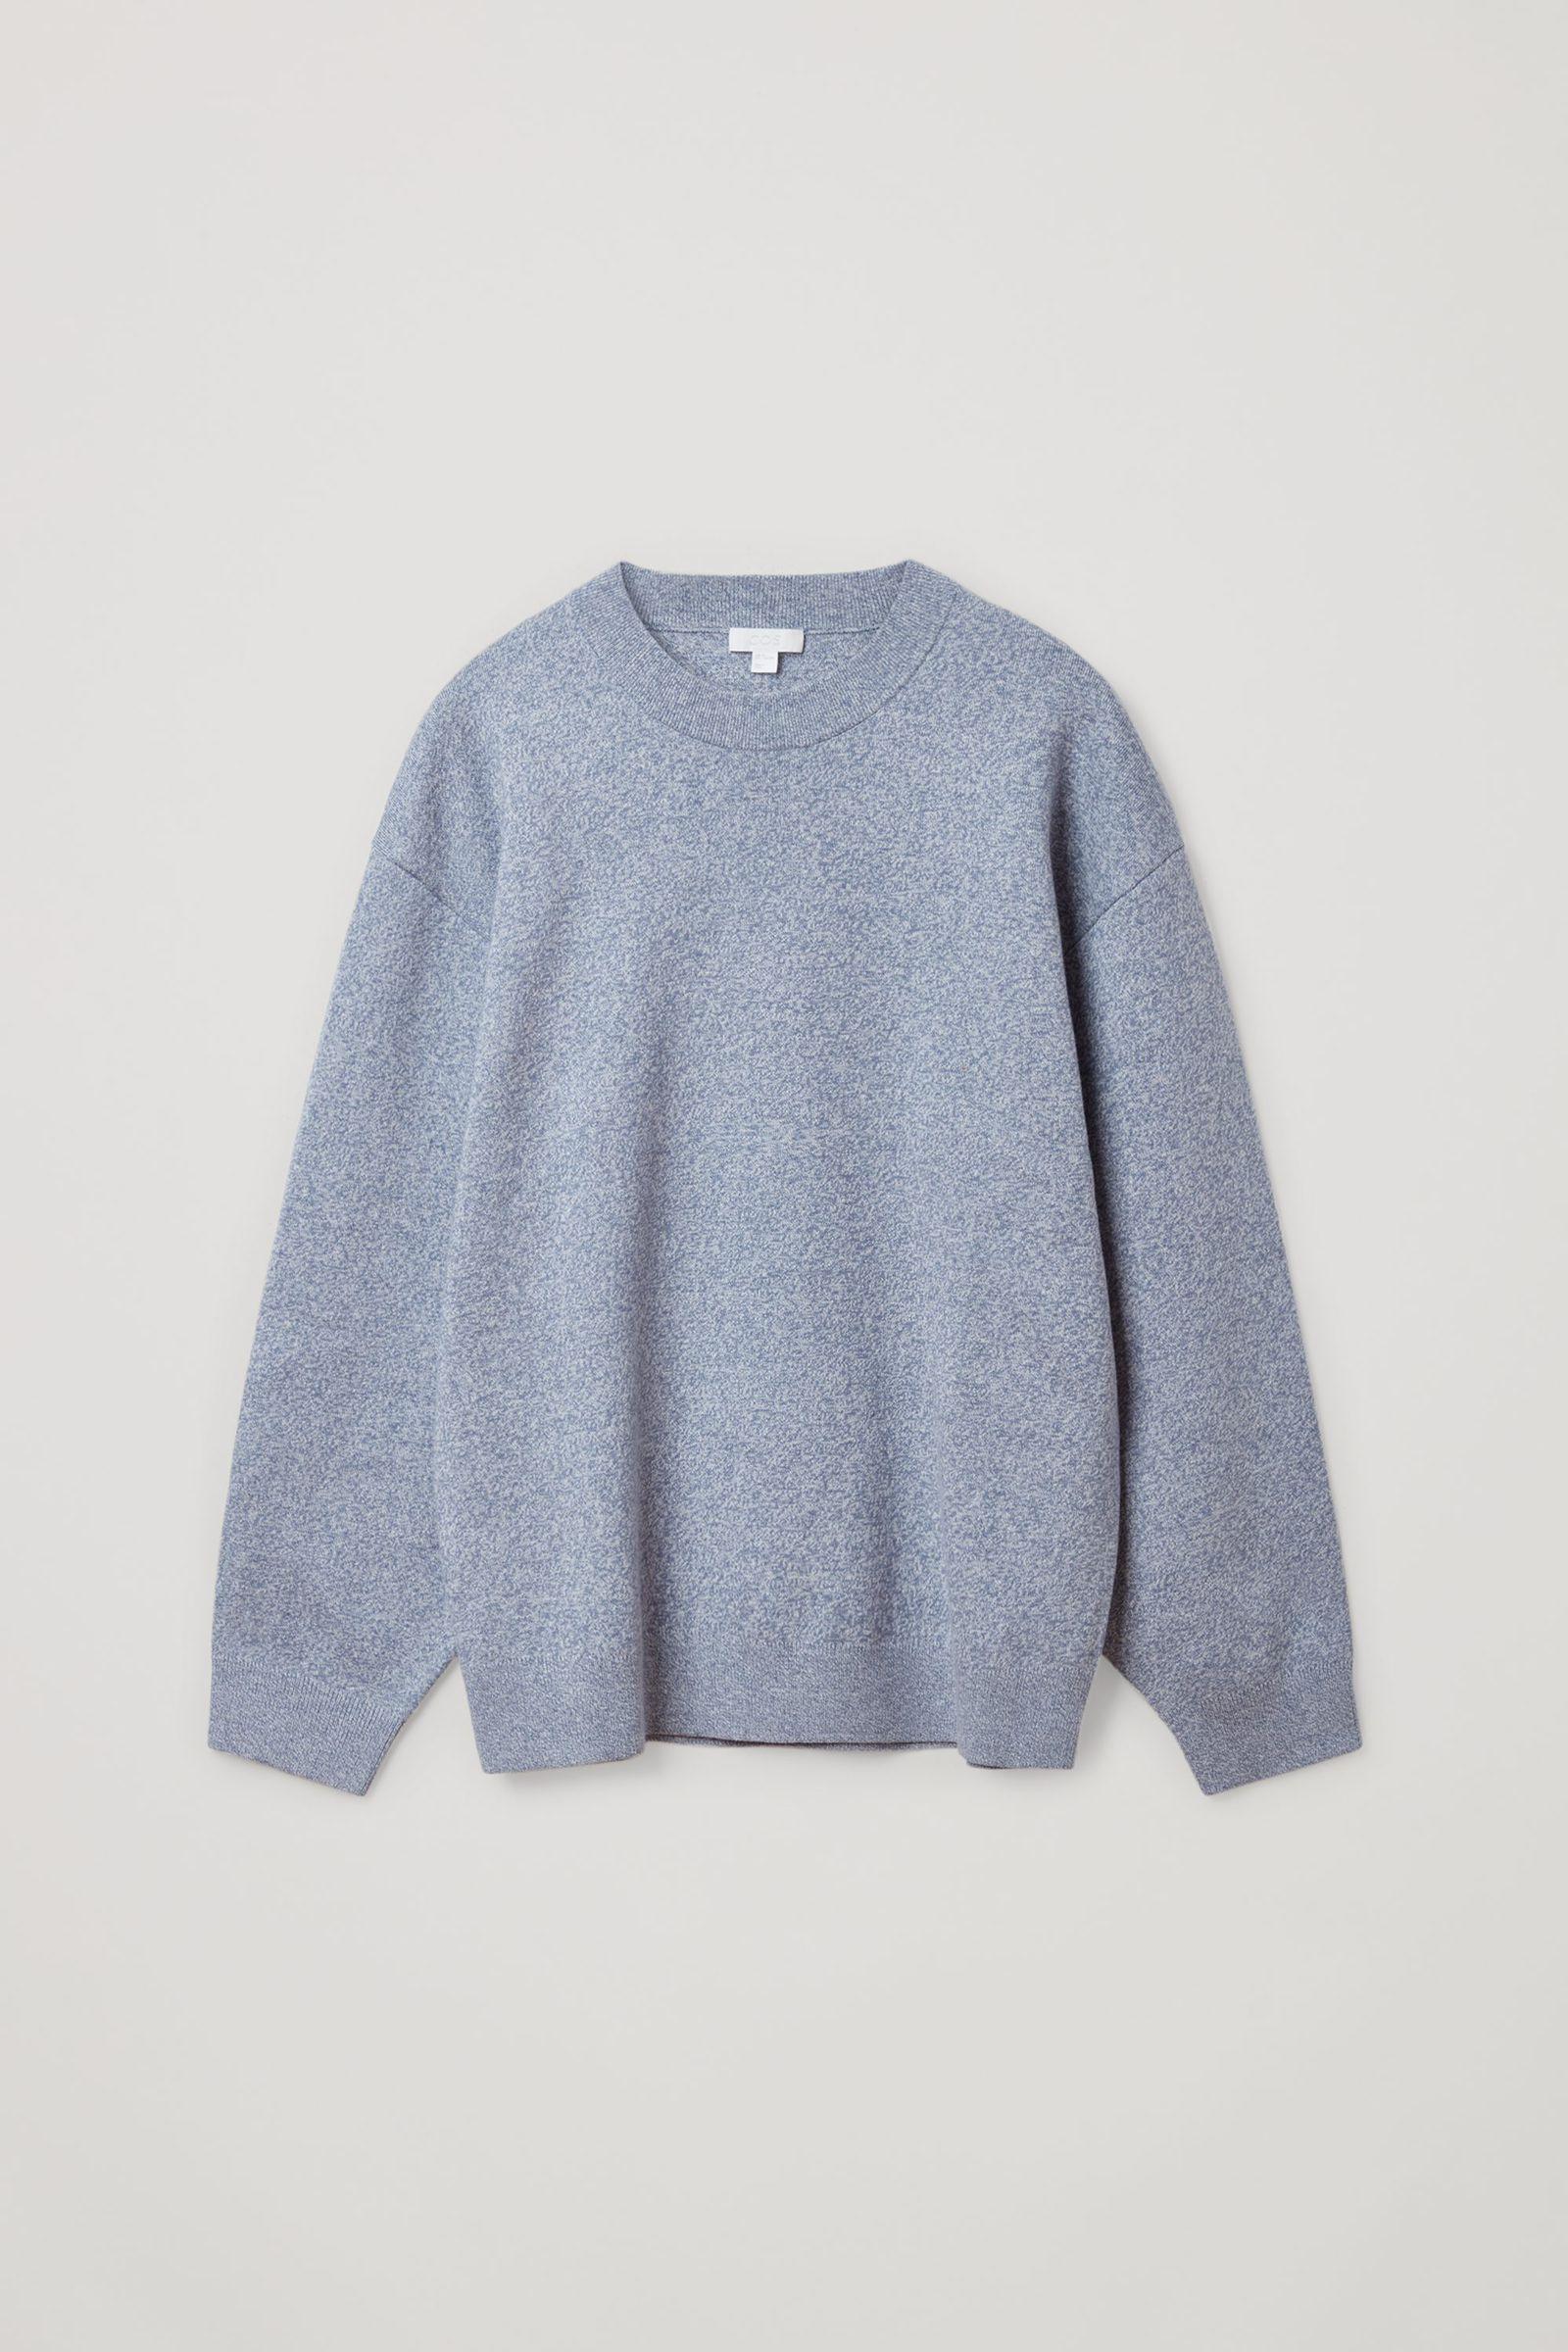 COS 니티드 코튼 메리노 스웨터의 블루컬러 Product입니다.